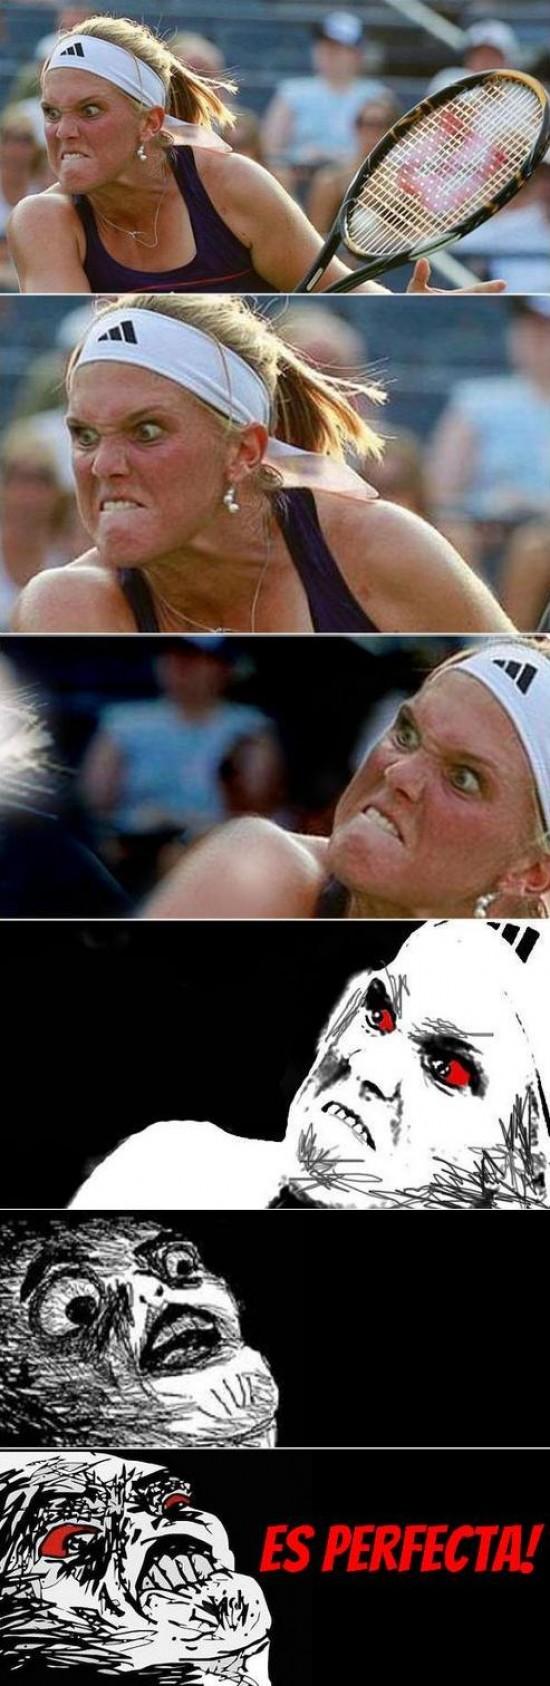 mujer,pareja,perfecta,raisins mujer,tenis